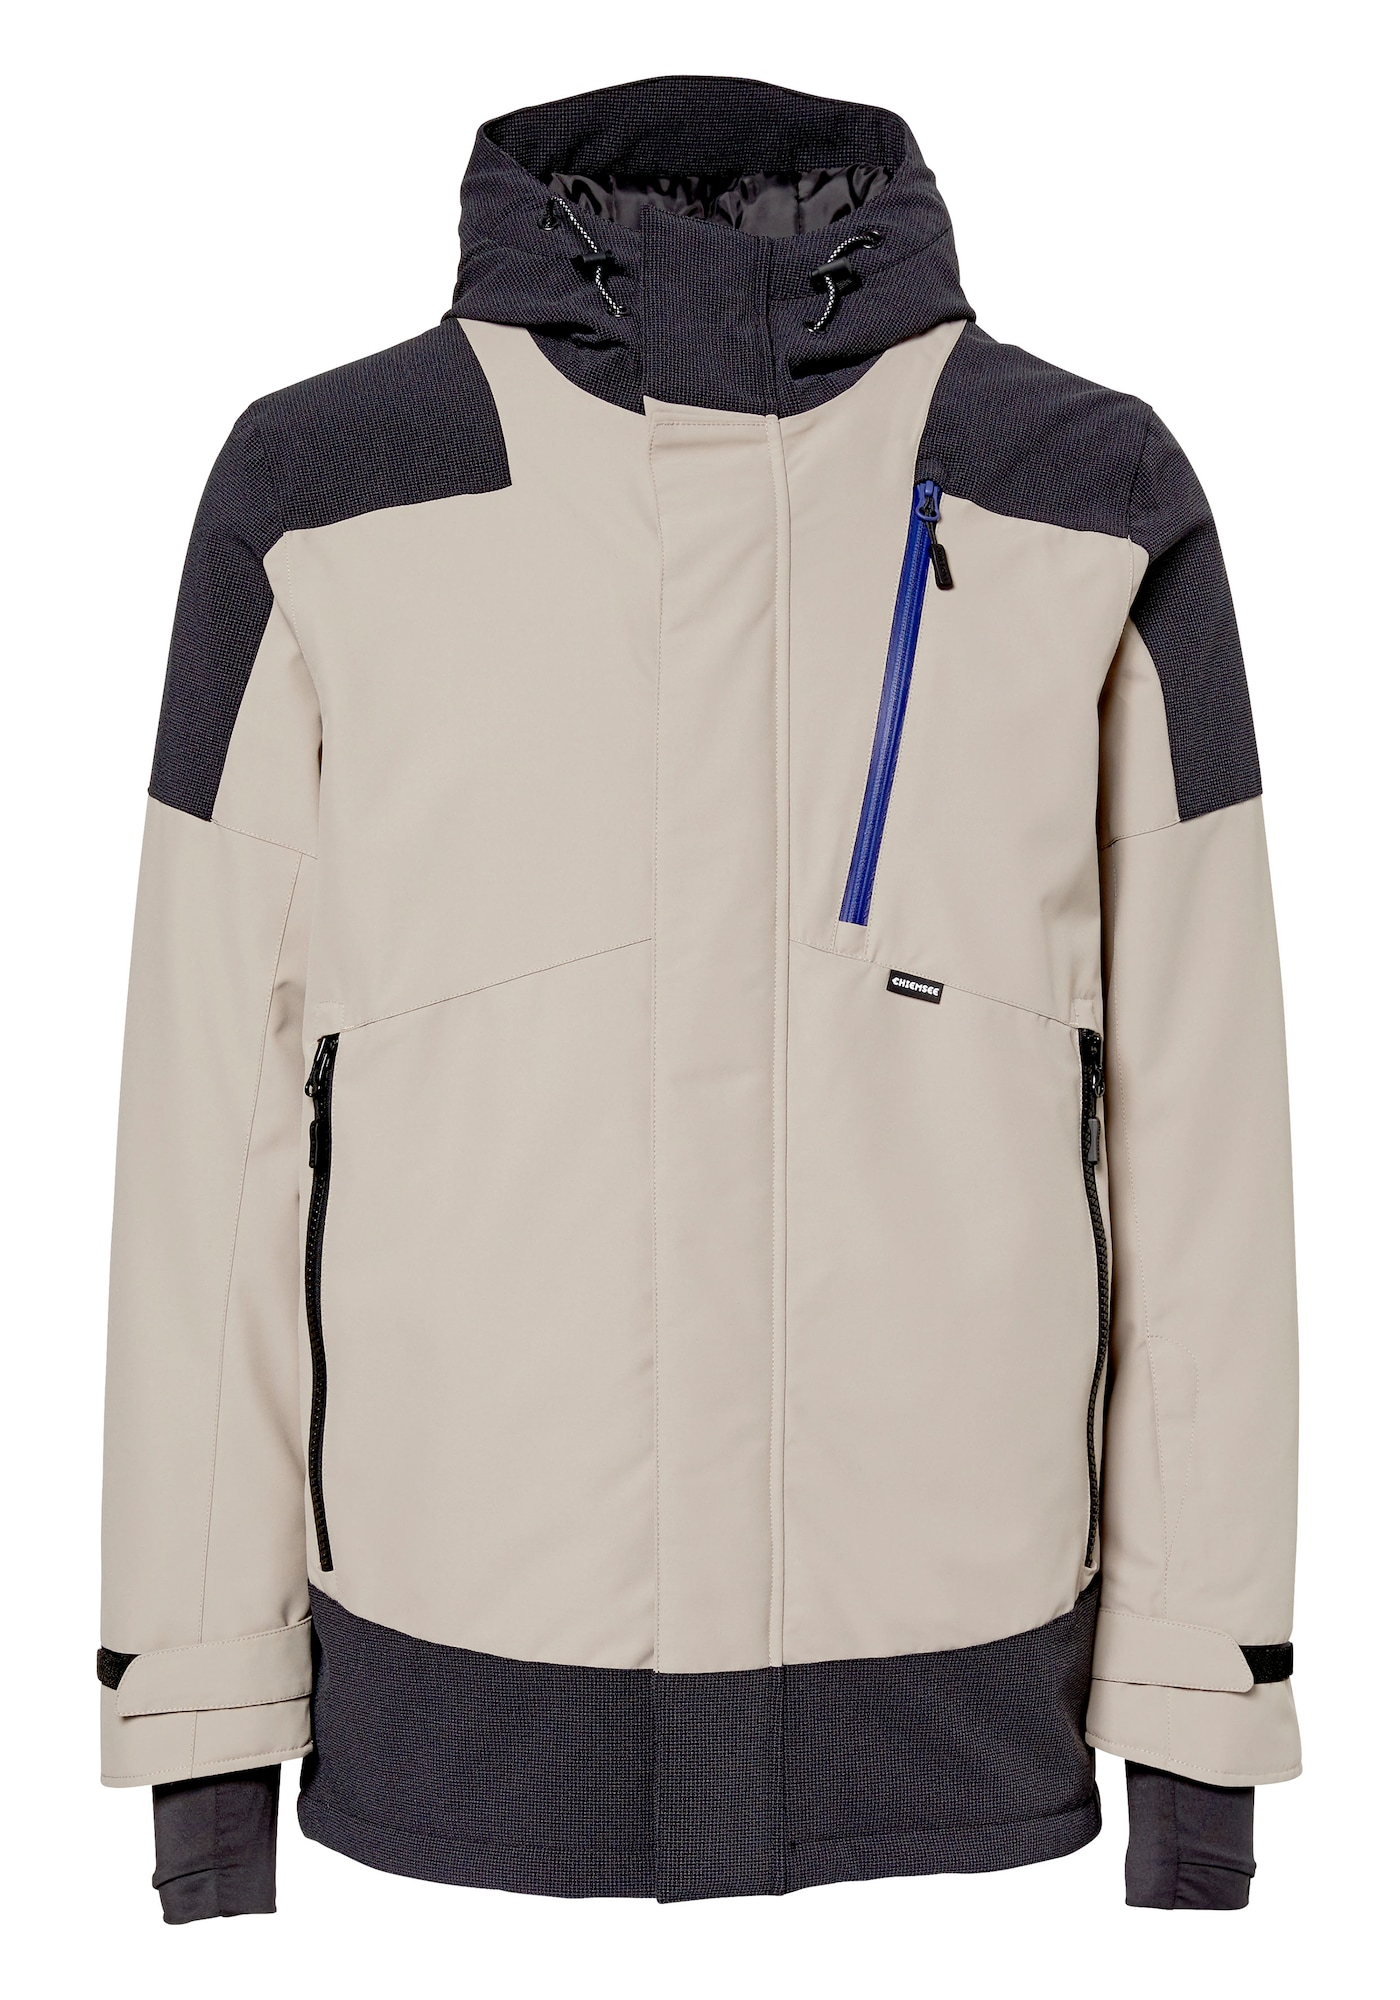 Sportjacke 'PARK CITY Ski Jacket' | Sportbekleidung > Sportjacken > Sonstige Sportjacken | Chiemsee